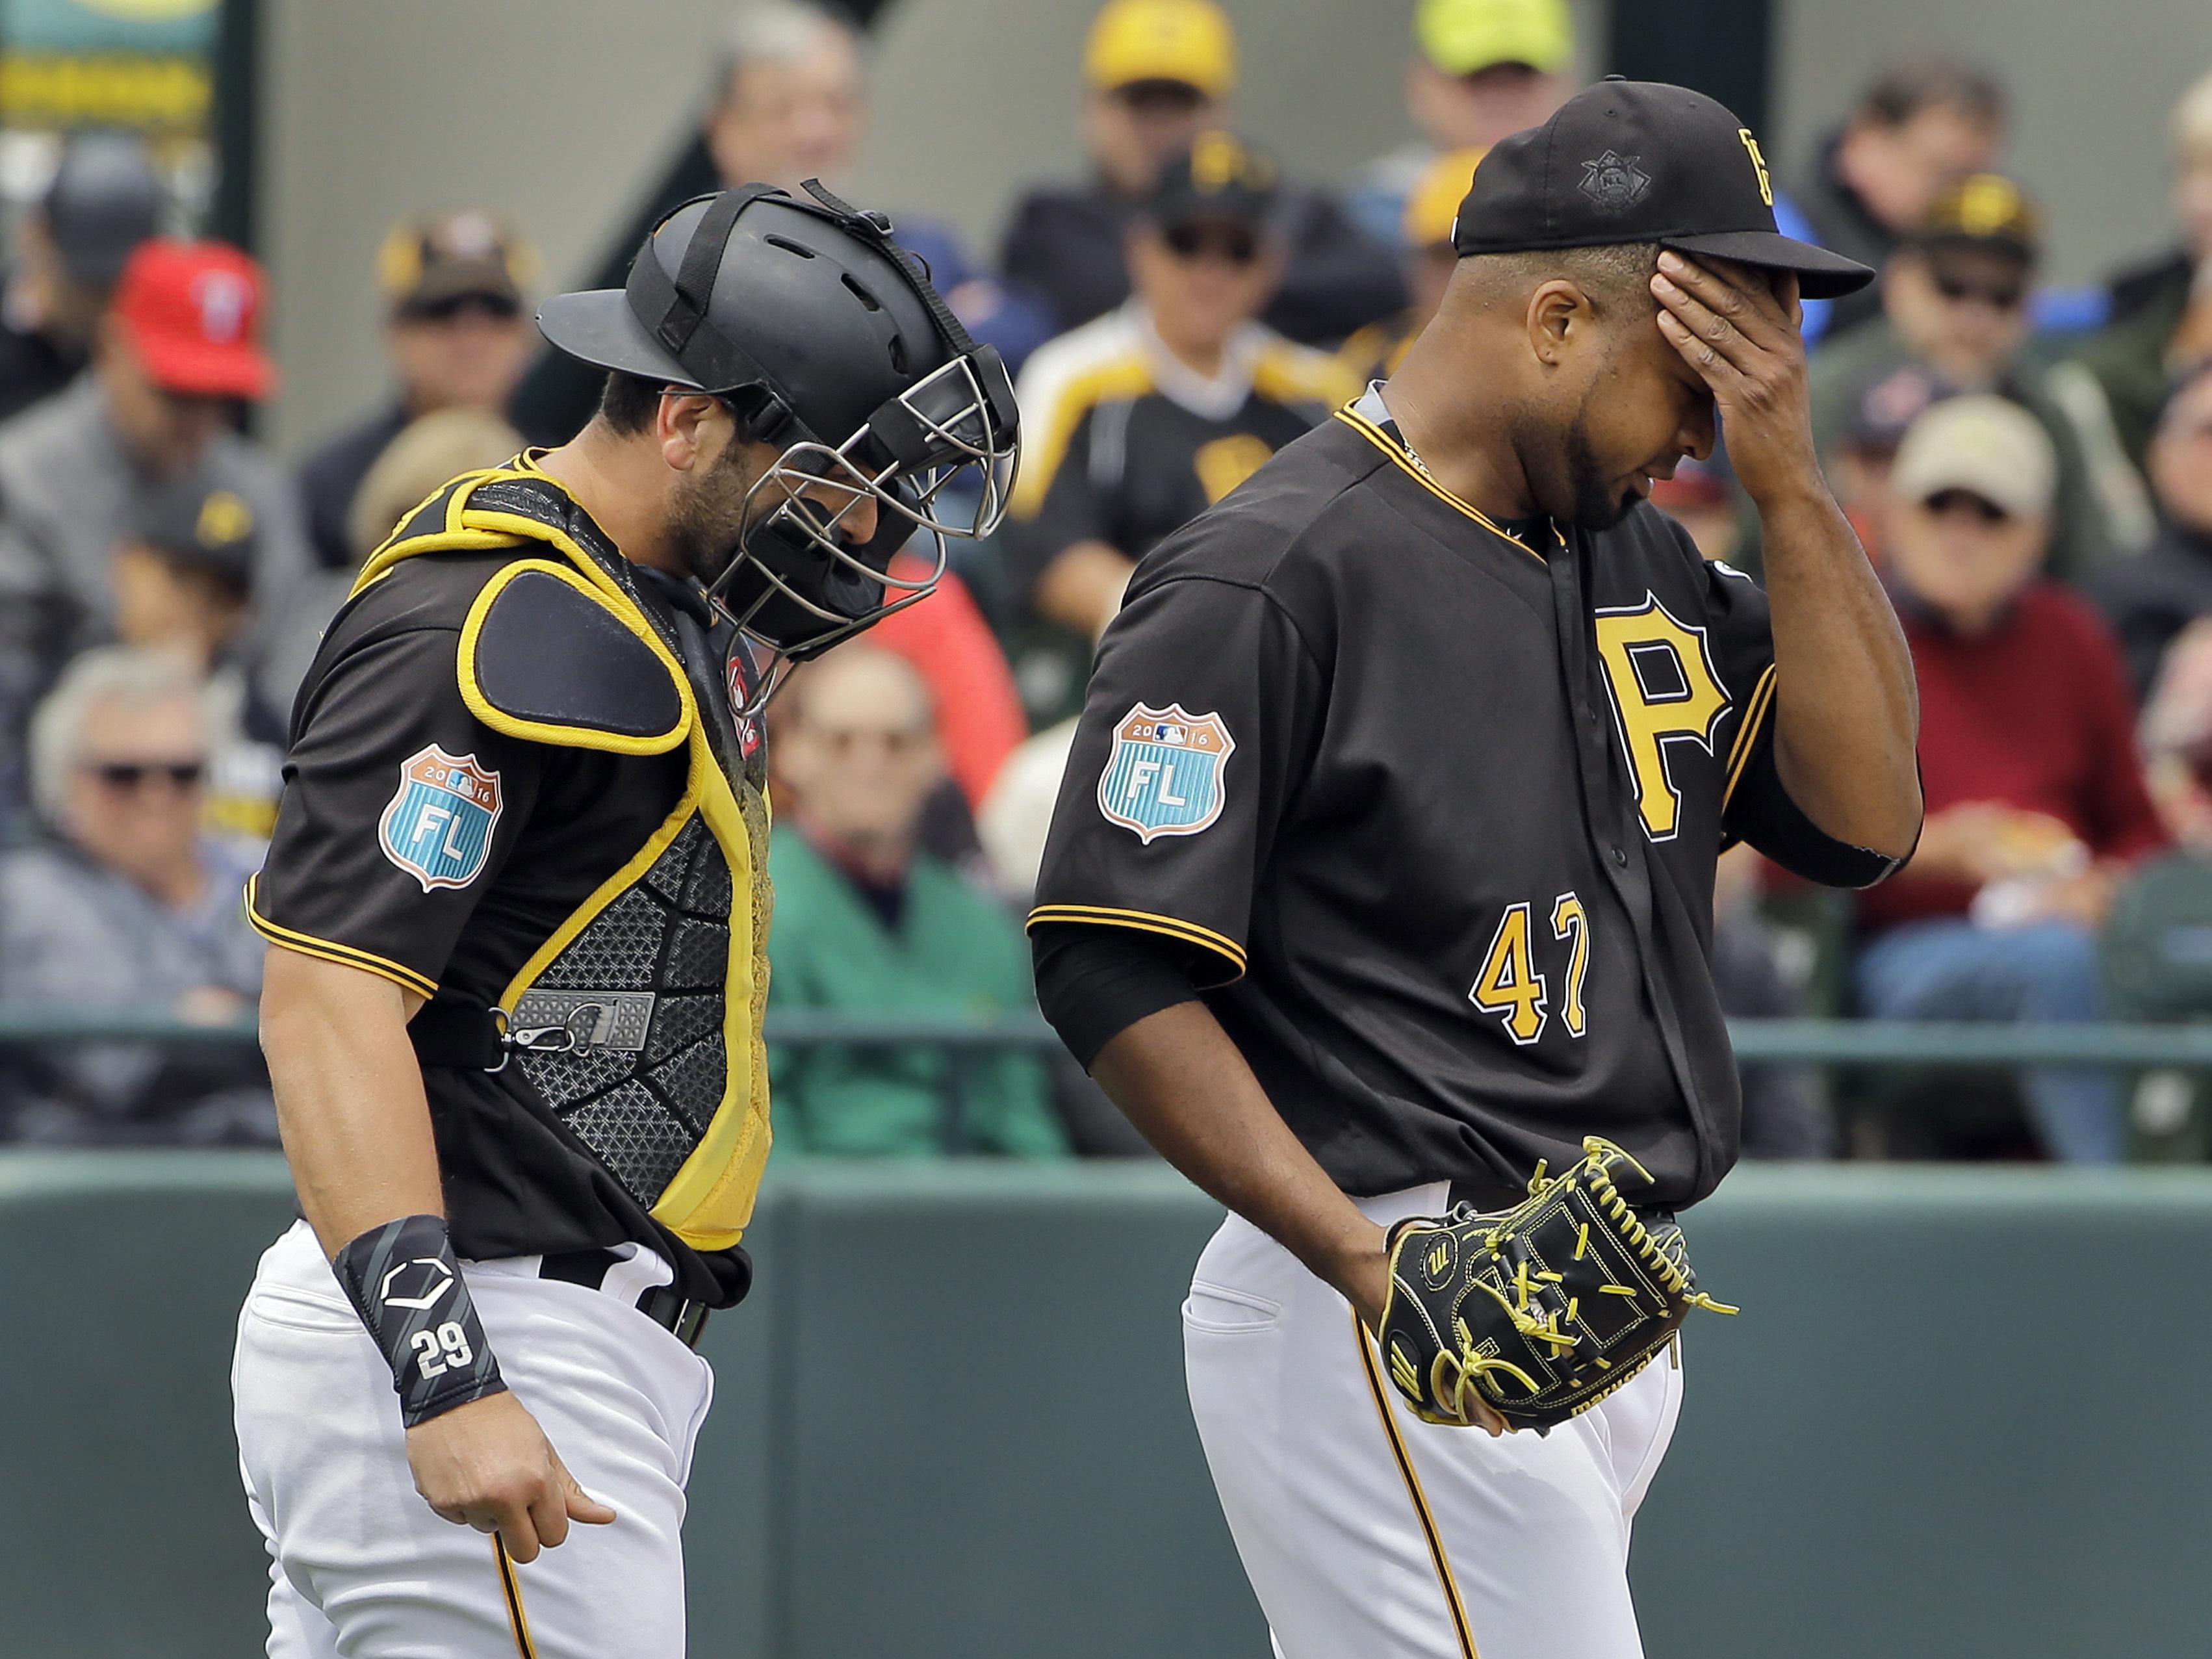 Braves_pirates_baseball